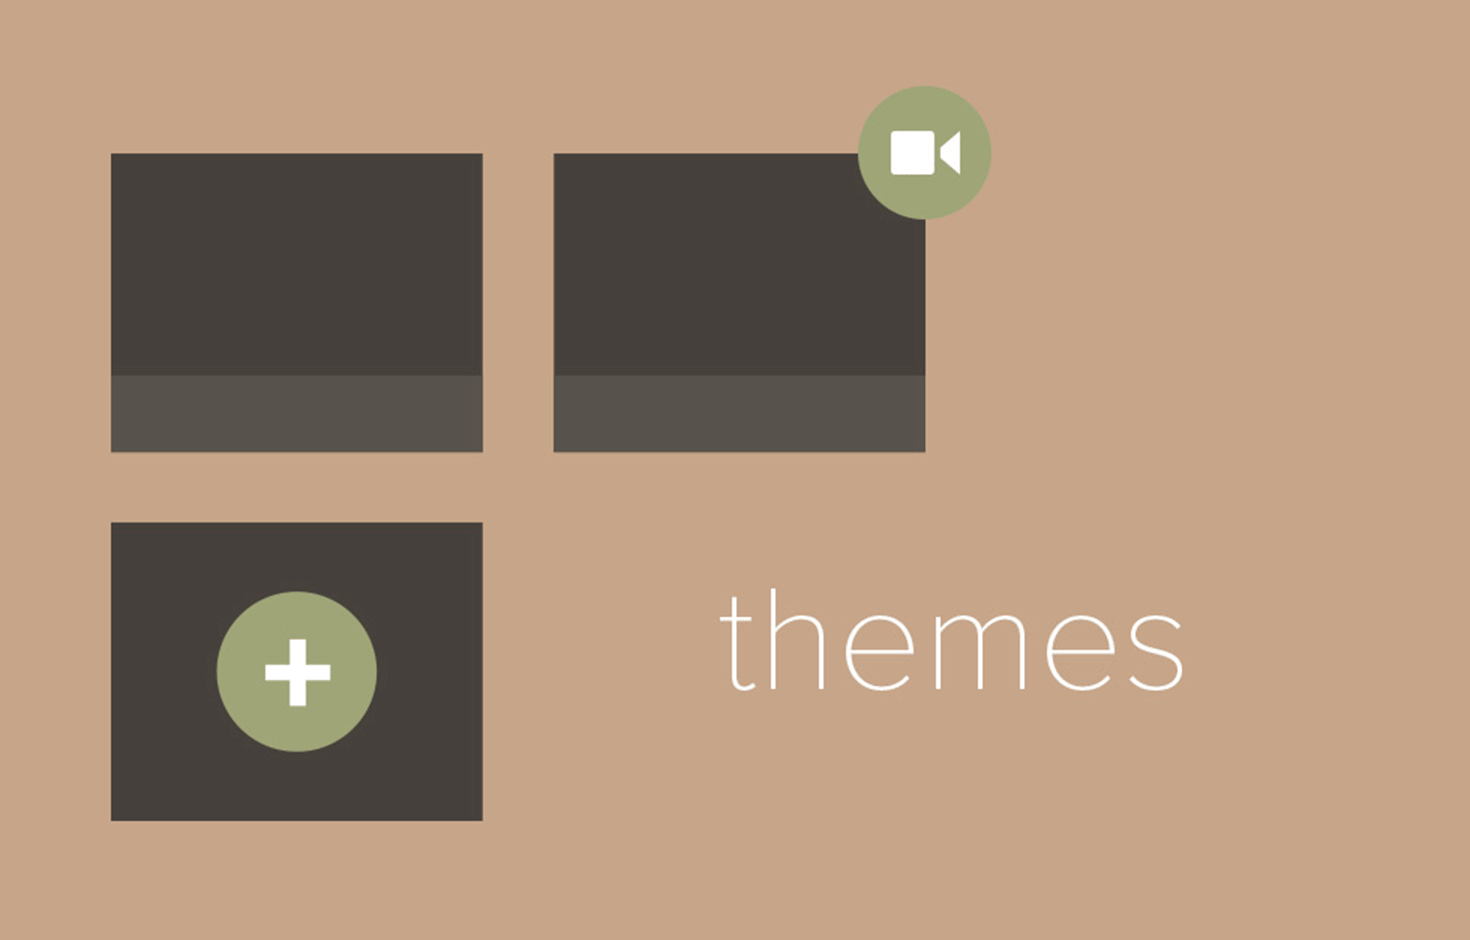 themes-thumb-1470x940